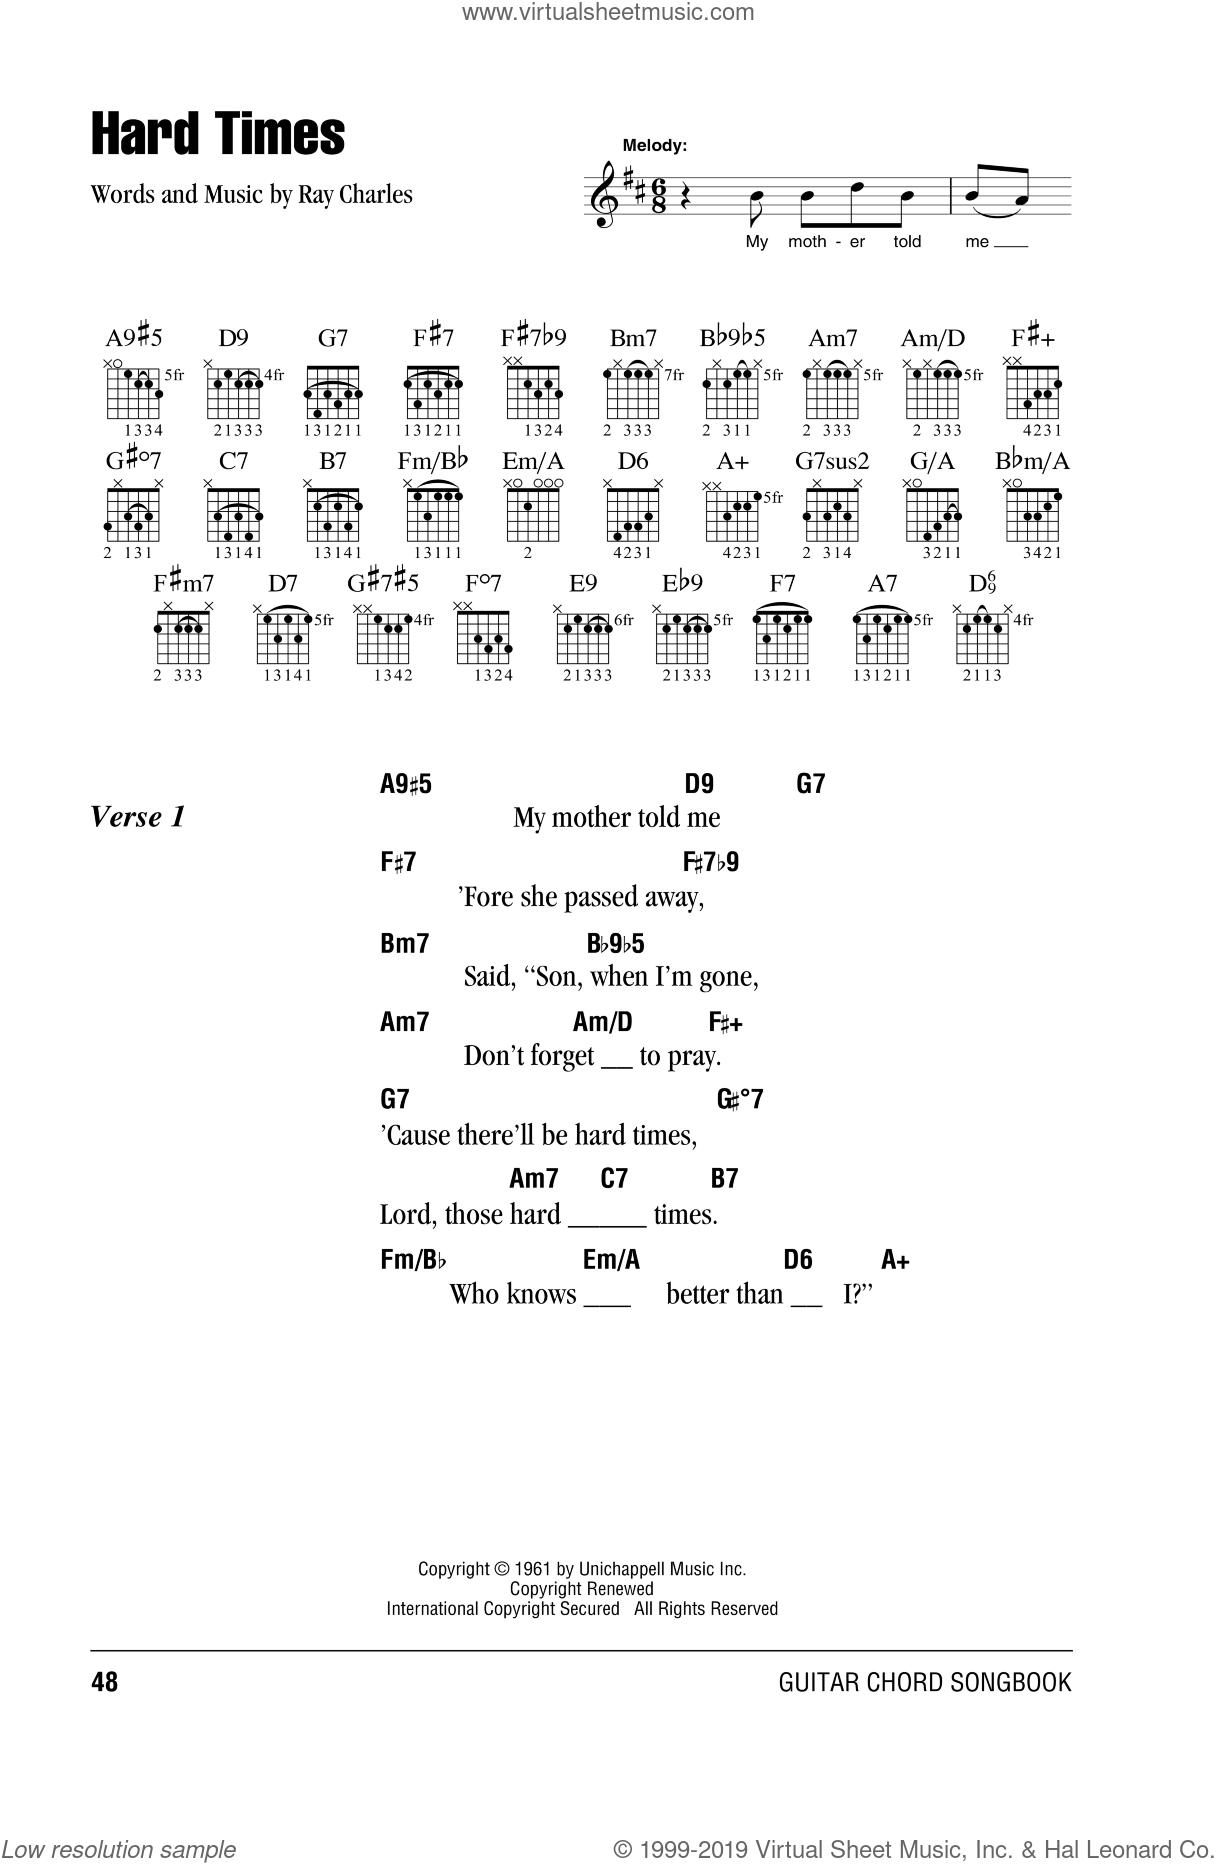 Clapton   Hard Times sheet music for guitar chords [PDF]